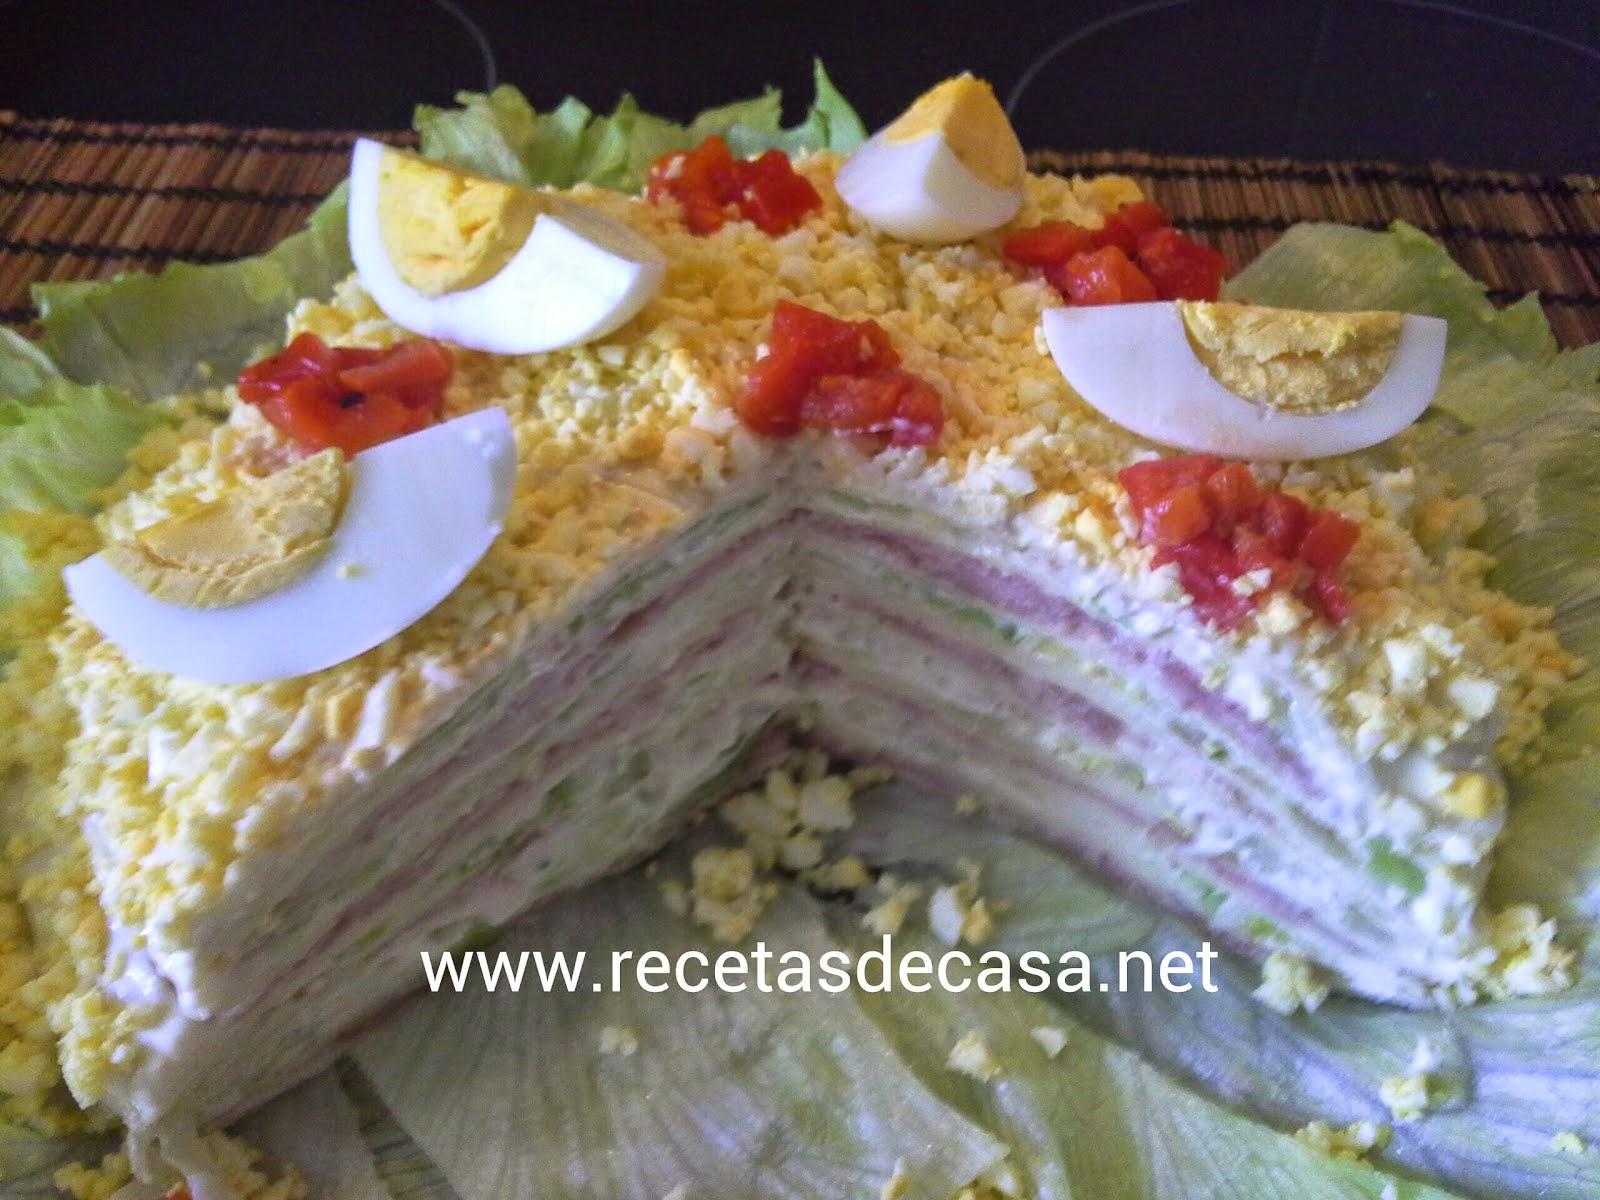 Seis recetas con mayonesa cocina for Q hacer de cenar hoy